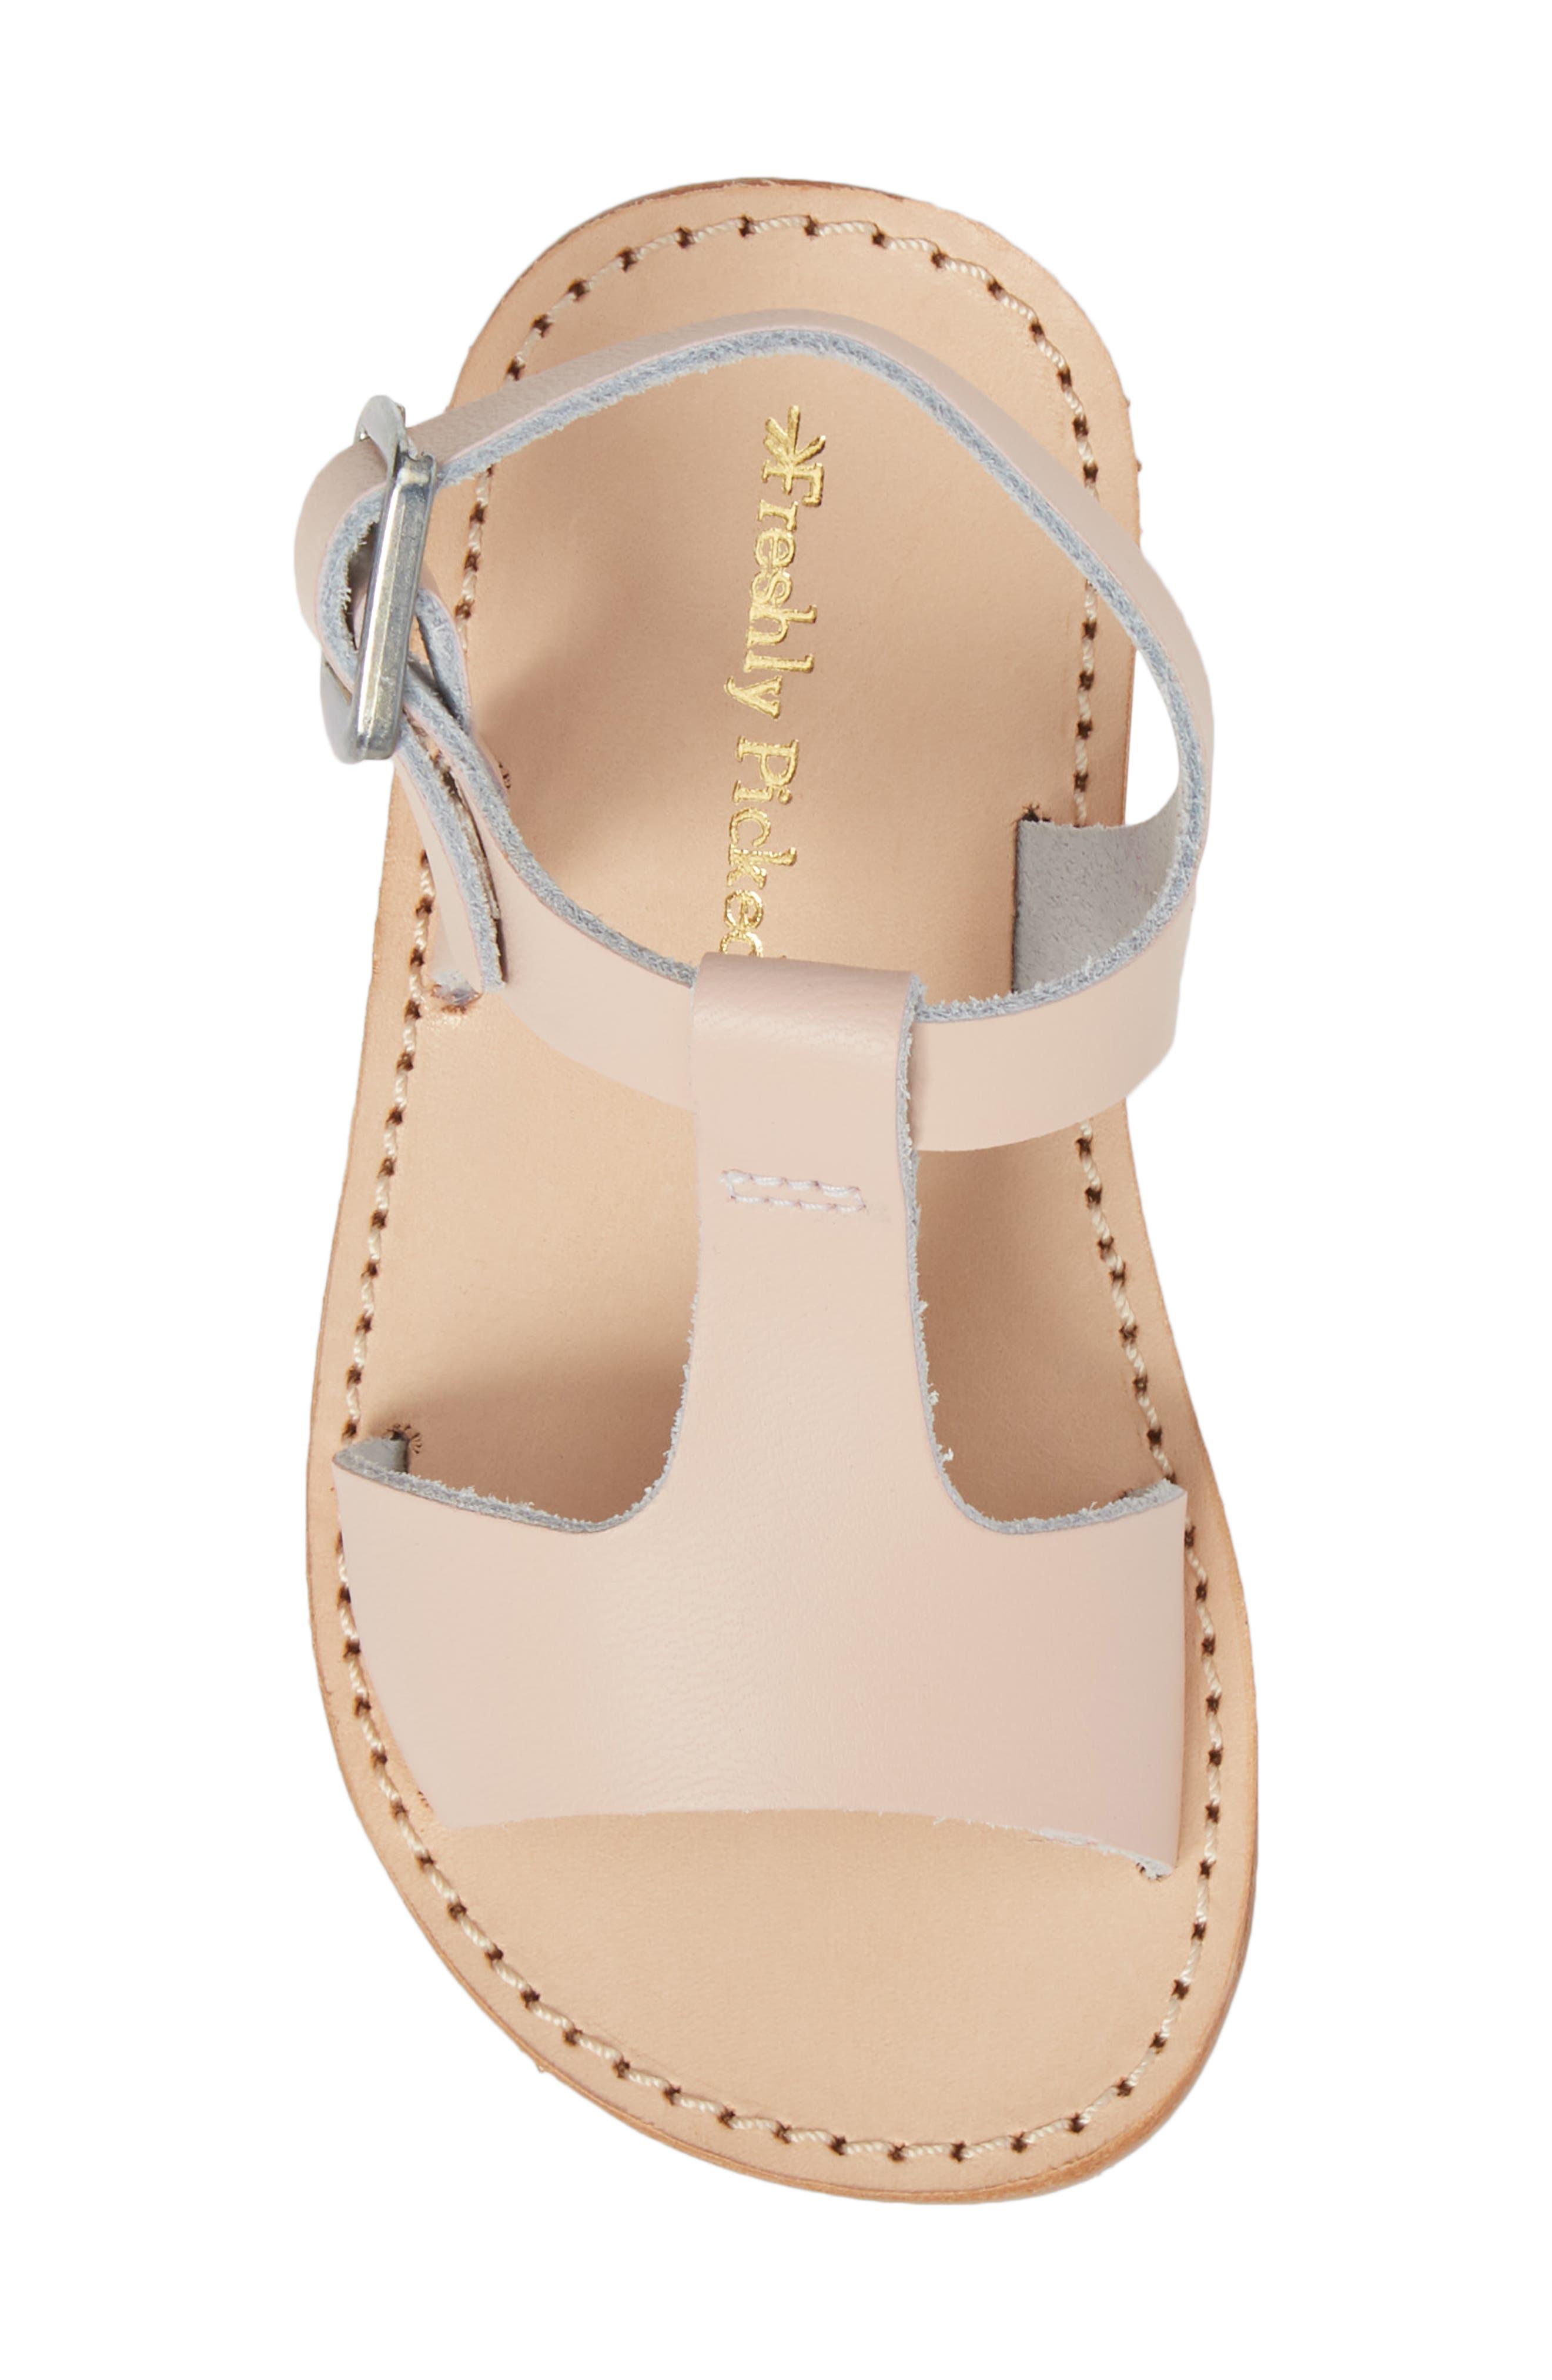 Malibu Water Resistant Sandal,                             Alternate thumbnail 5, color,                             Blush